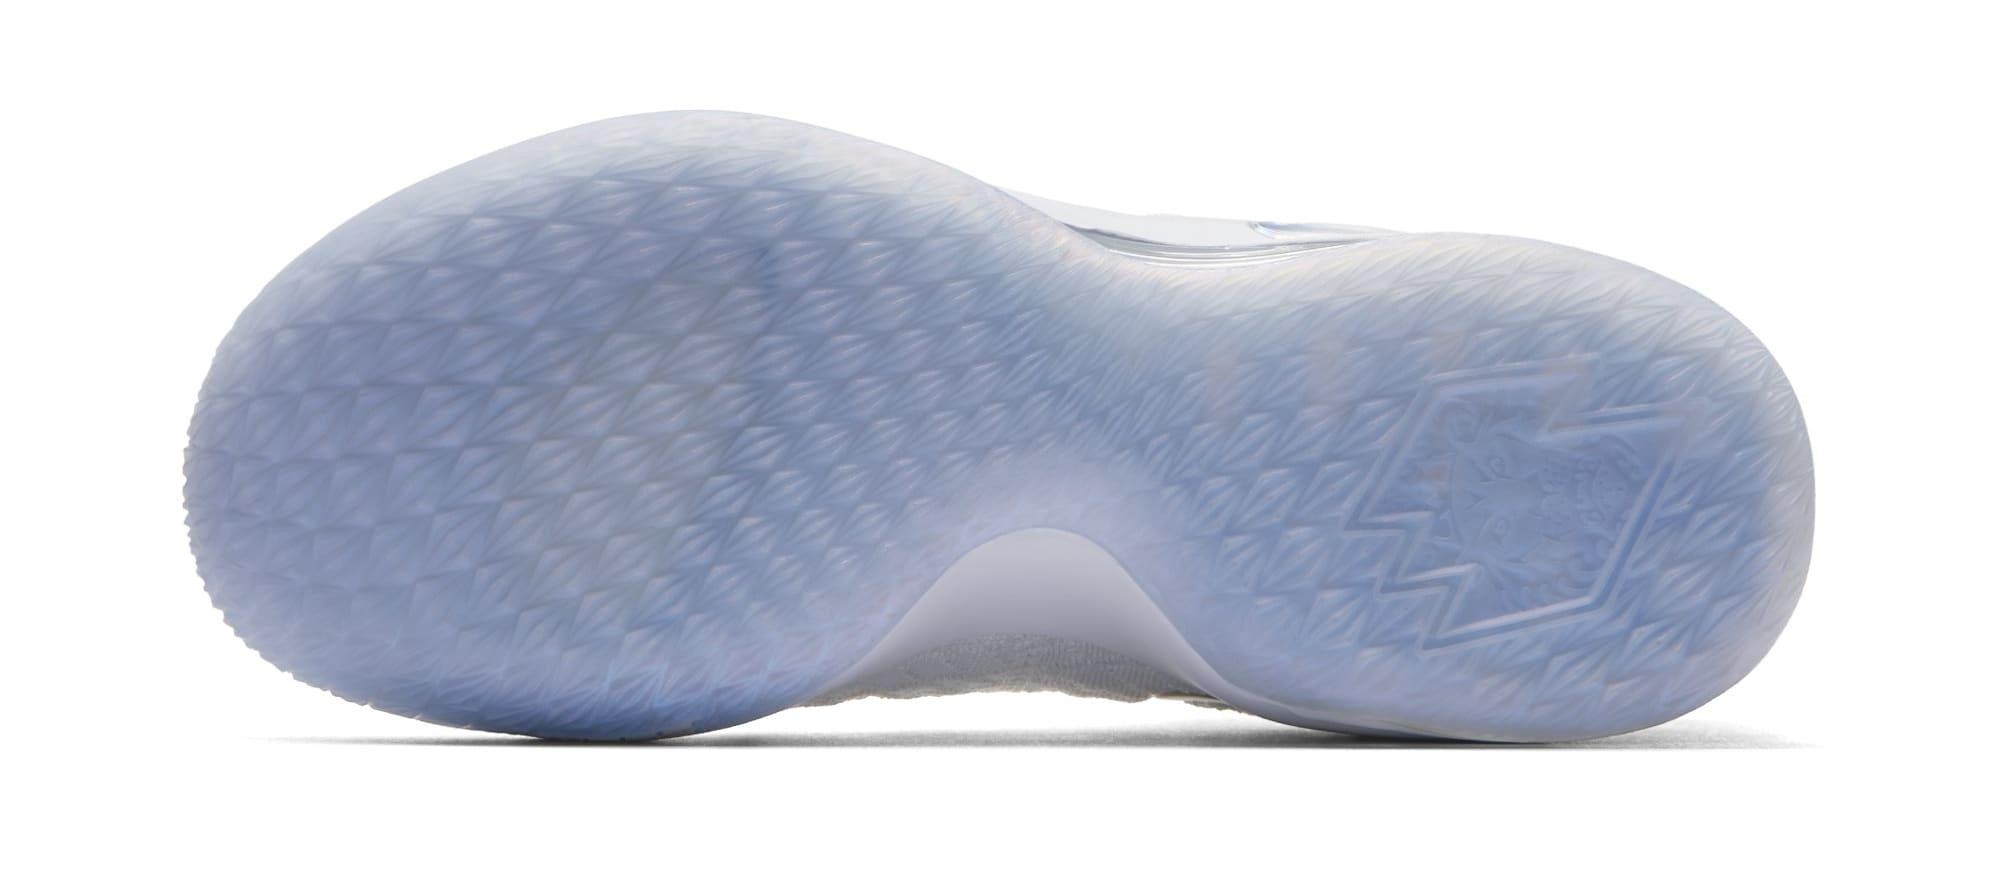 Nike LeBron 15 Low 'White' AO1755-100 (Bottom)